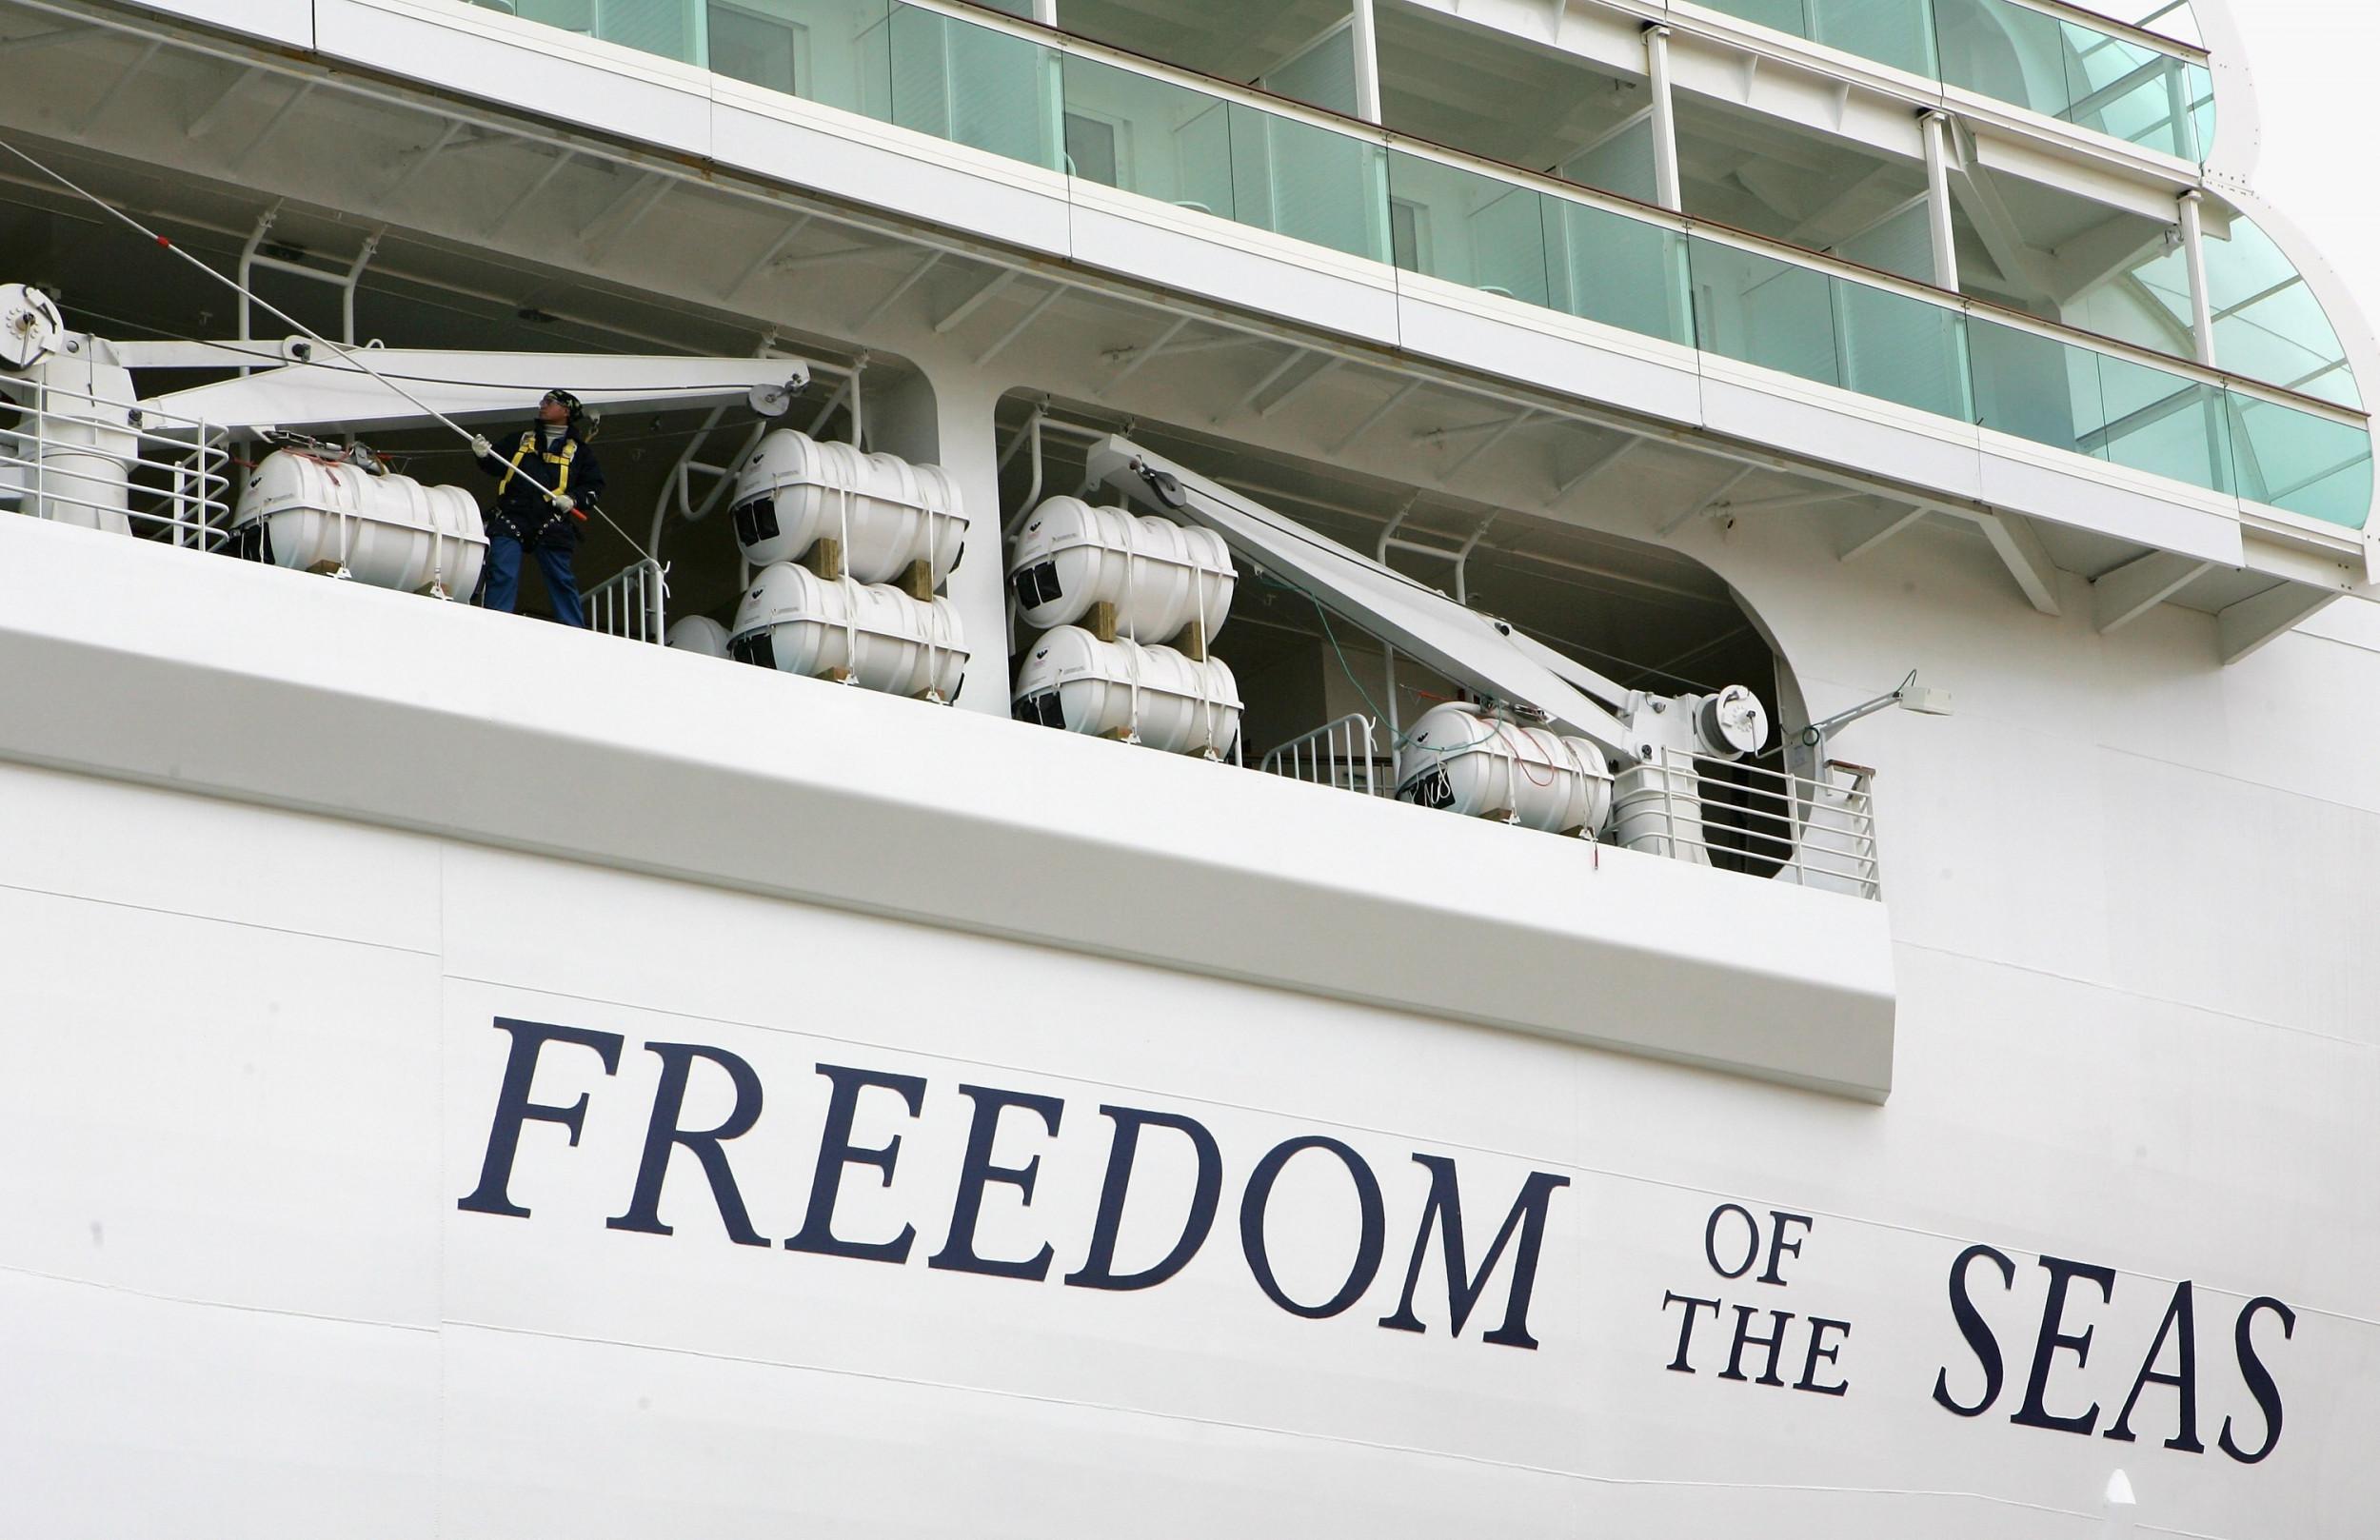 Cruise Ship Baby Death: Family's Lawyer Says Royal Caribbean Hasn't